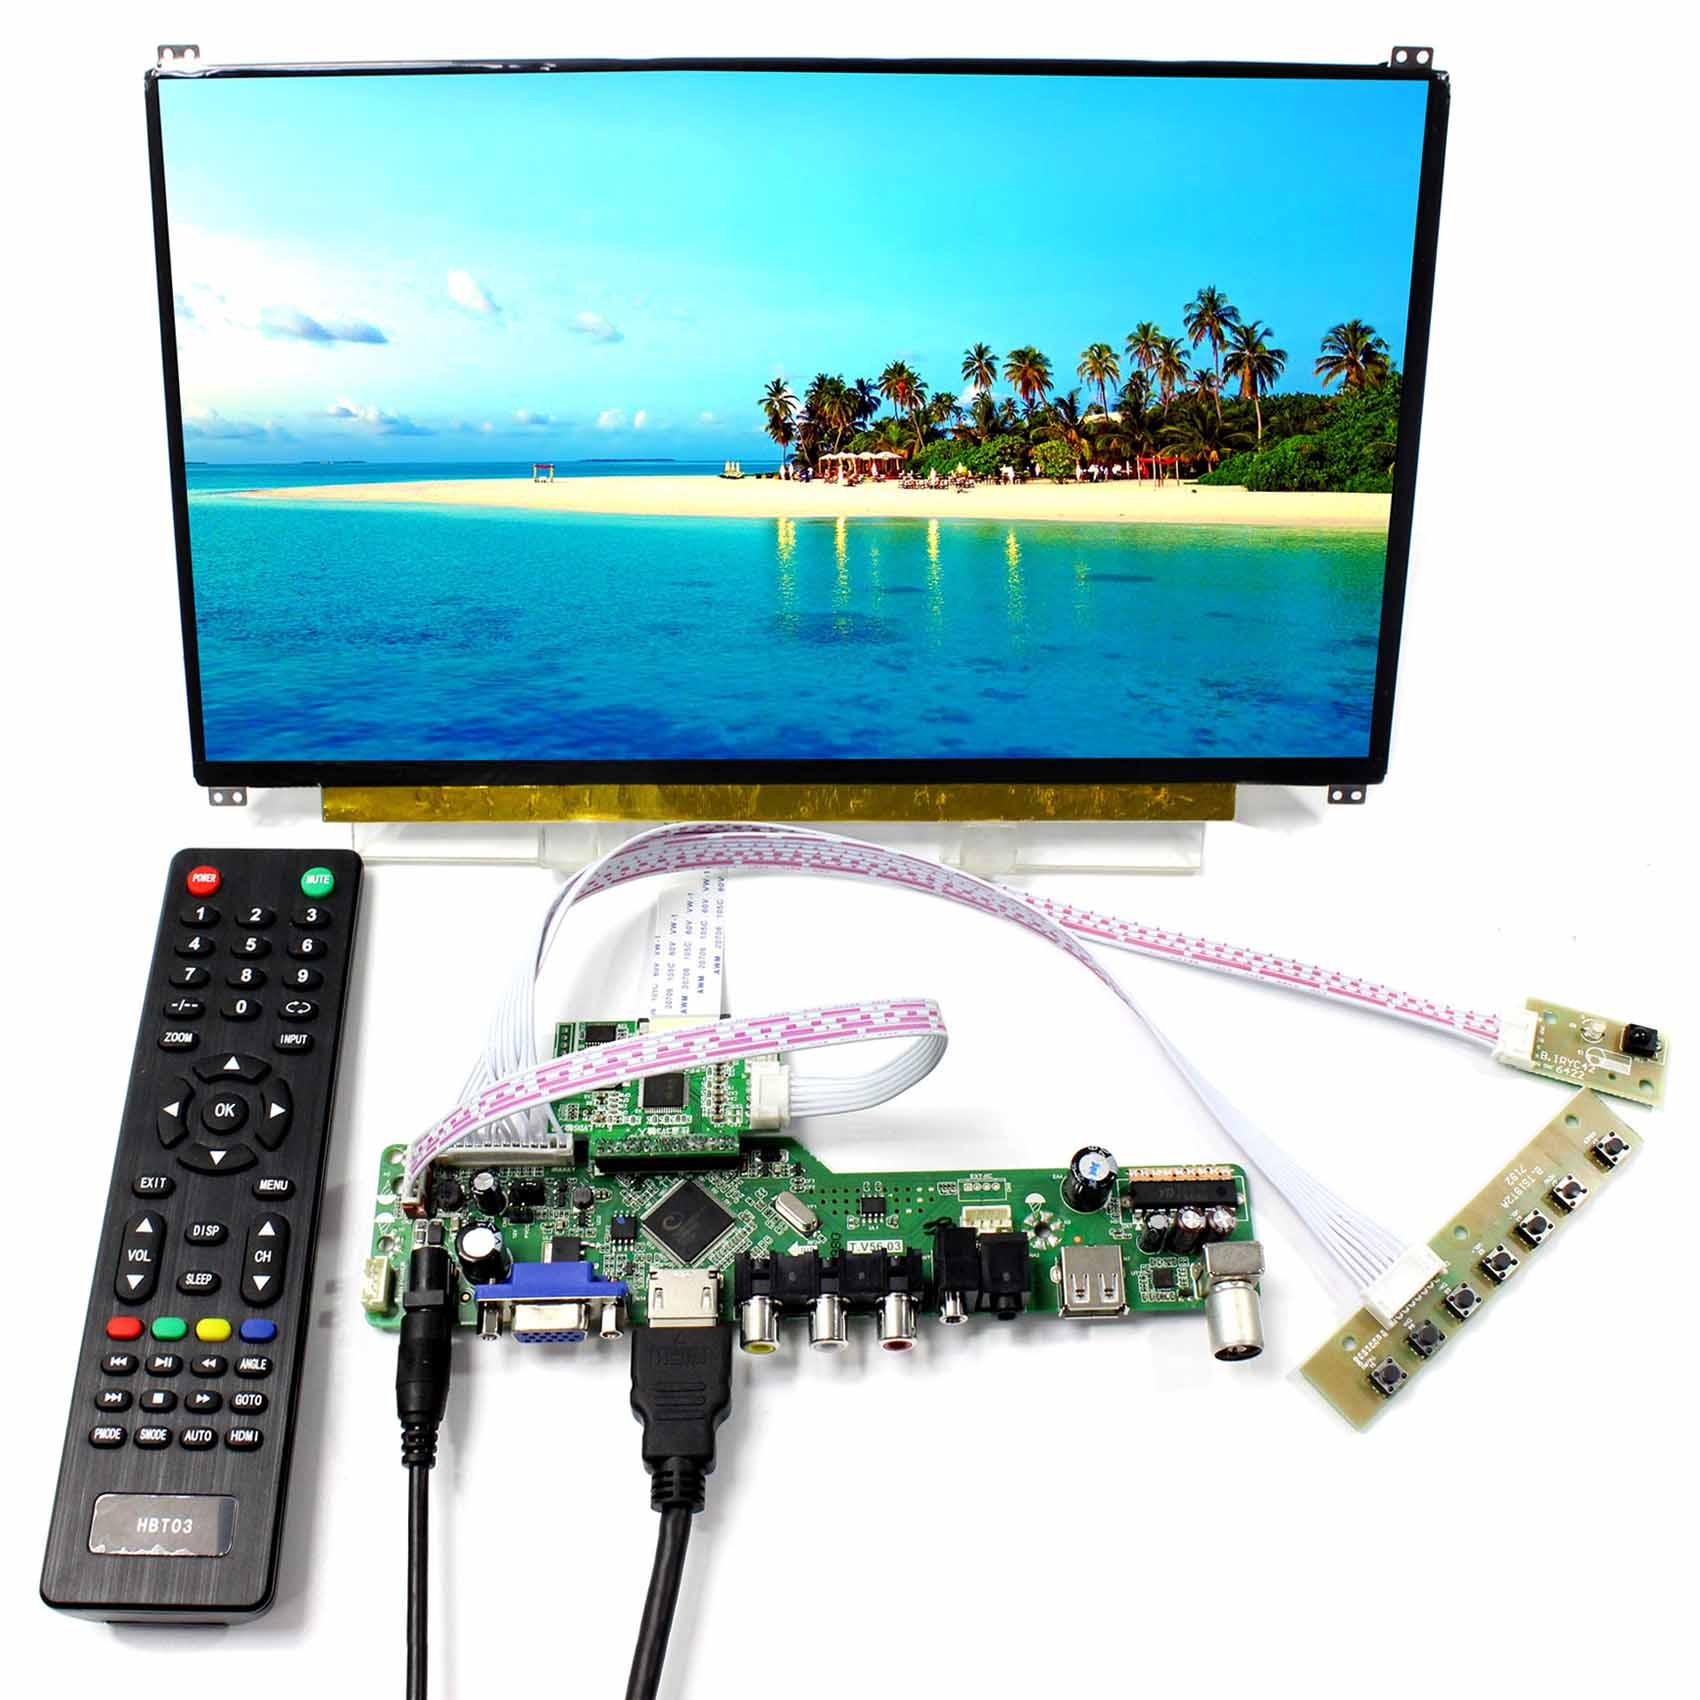 13.3 N133HSE Retroilluminazione WLED Risoluzione 1920x1080 da 13.3 pollici IPS Schermo LCD 30 pin Connettore eDP13.3 N133HSE Retroilluminazione WLED Risoluzione 1920x1080 da 13.3 pollici IPS Schermo LCD 30 pin Connettore eDP